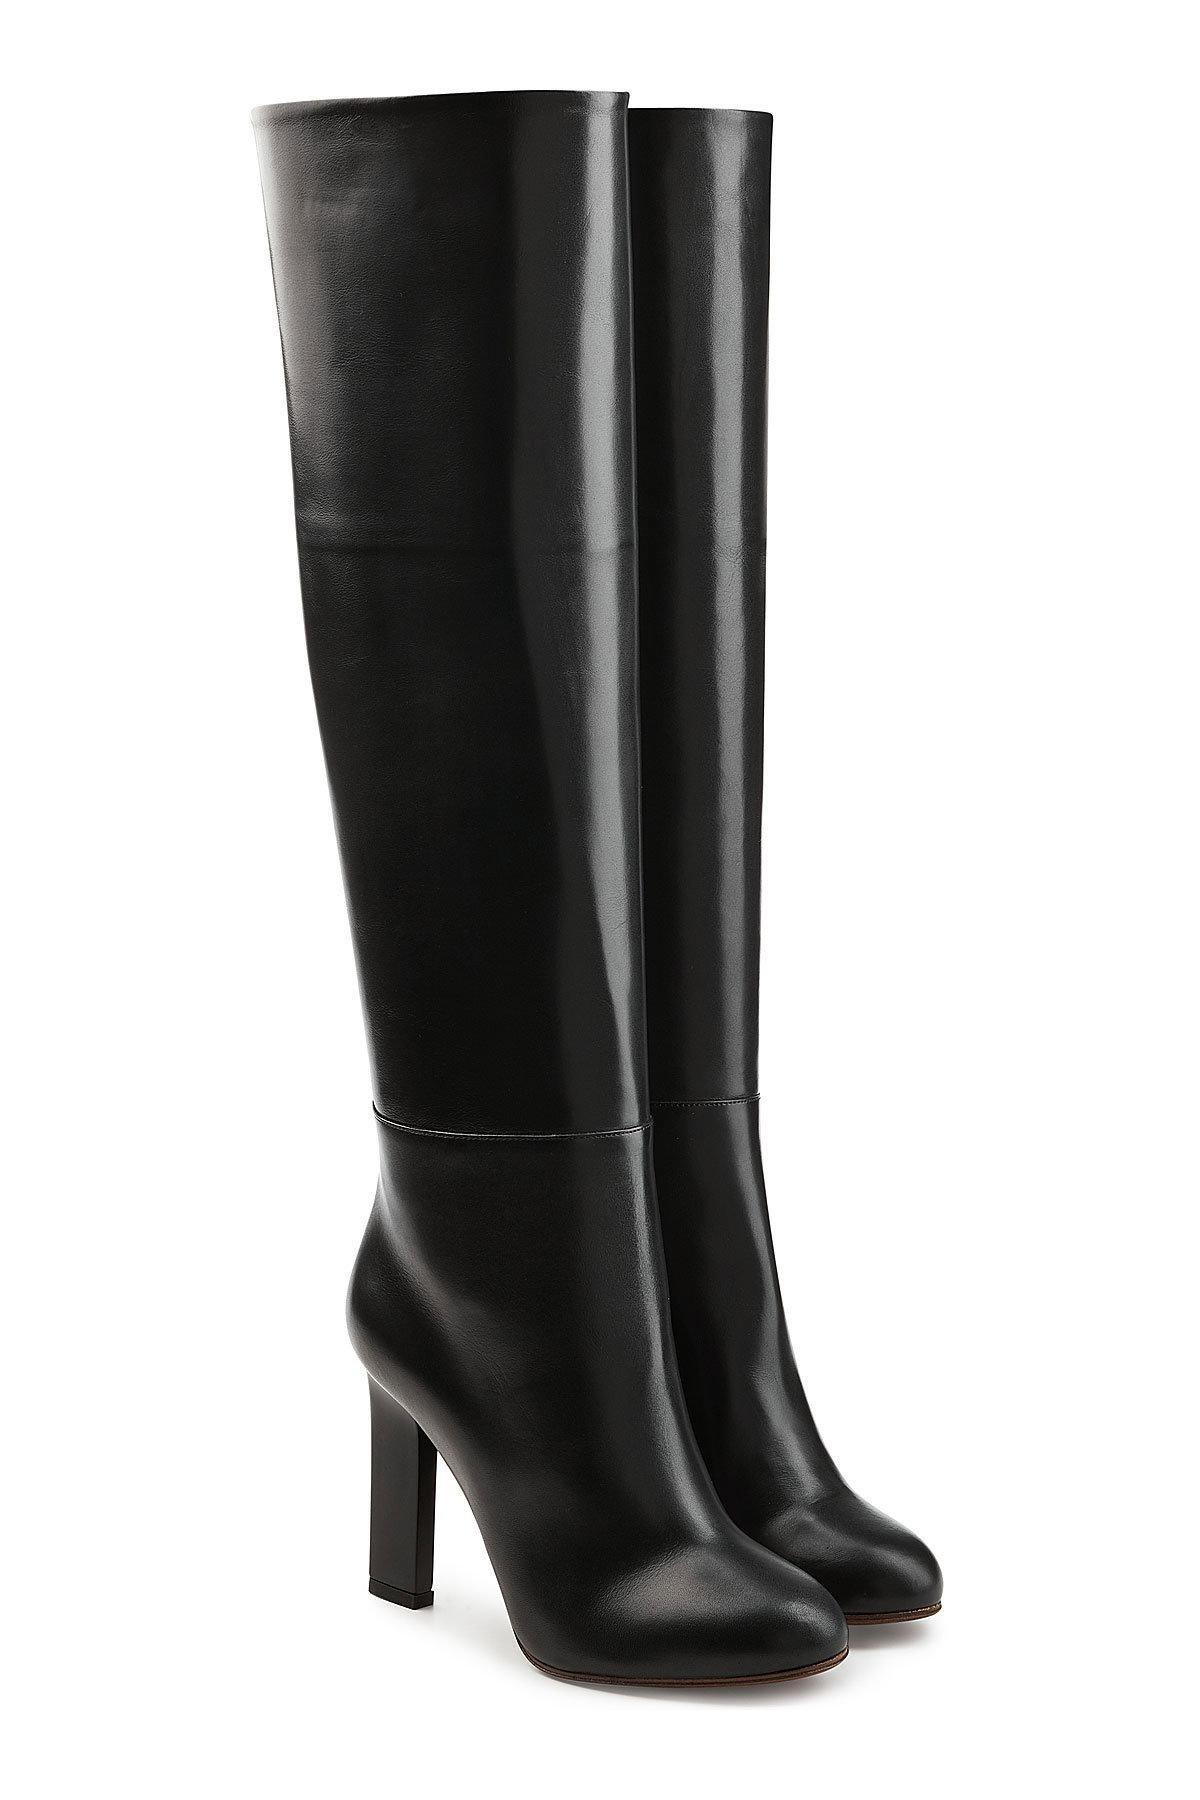 Ponyhair Boot Victoria Beckham eLMqfNJ